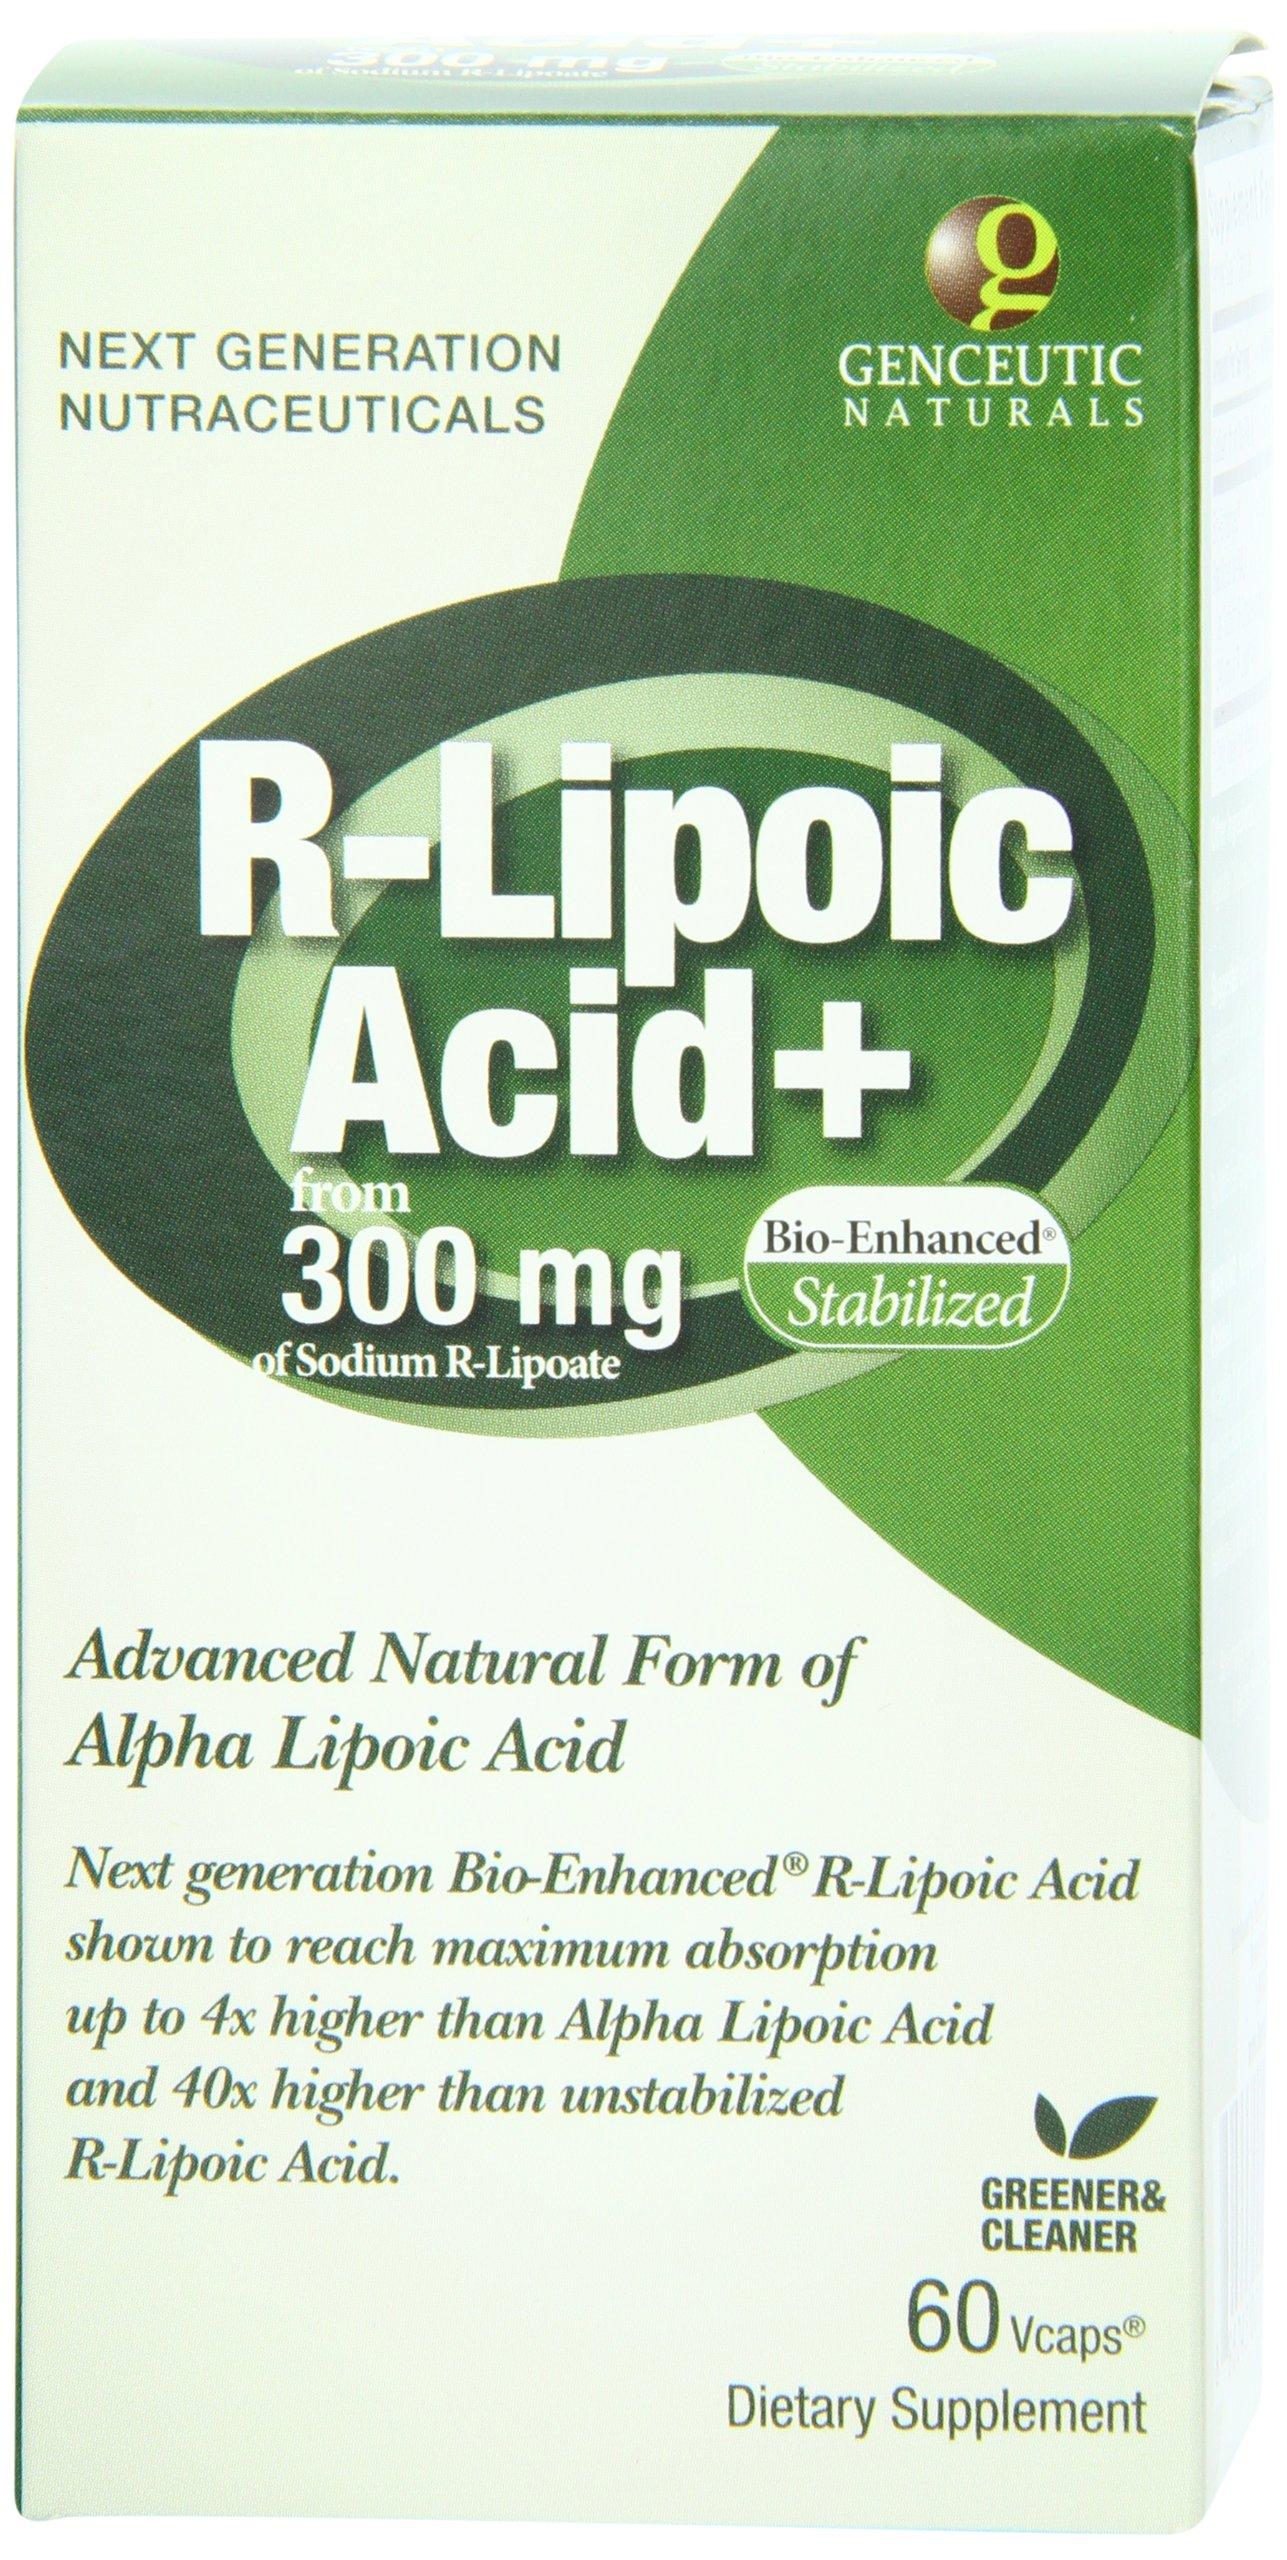 91mAVlZh6NL - Genceutic Naturals R-Lipoic Acid 300 Mg, 60-Count